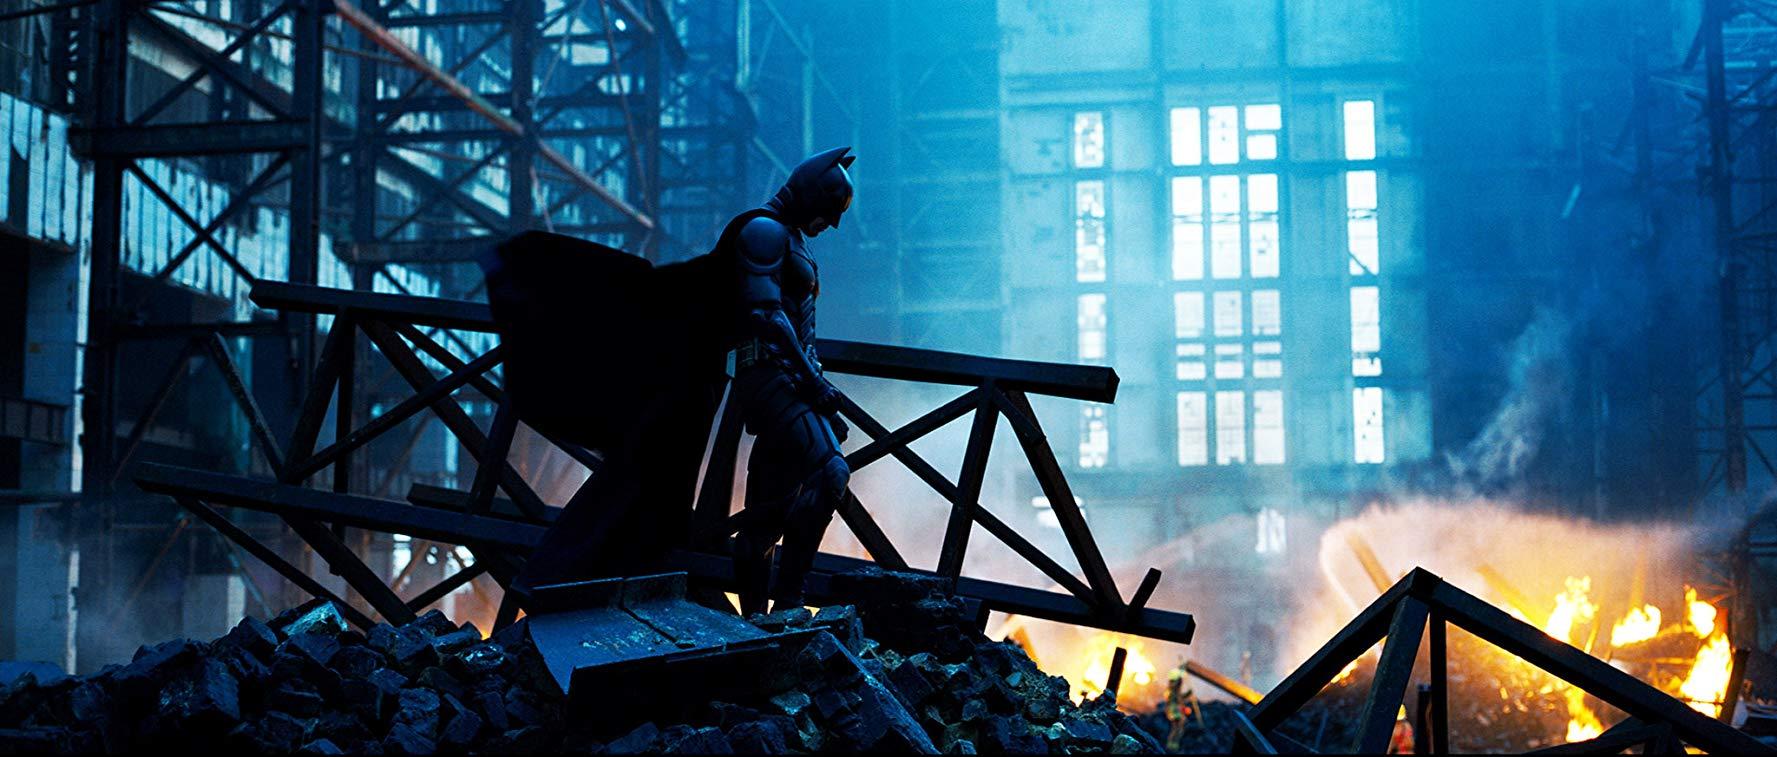 the dark knight, batman, christian bale